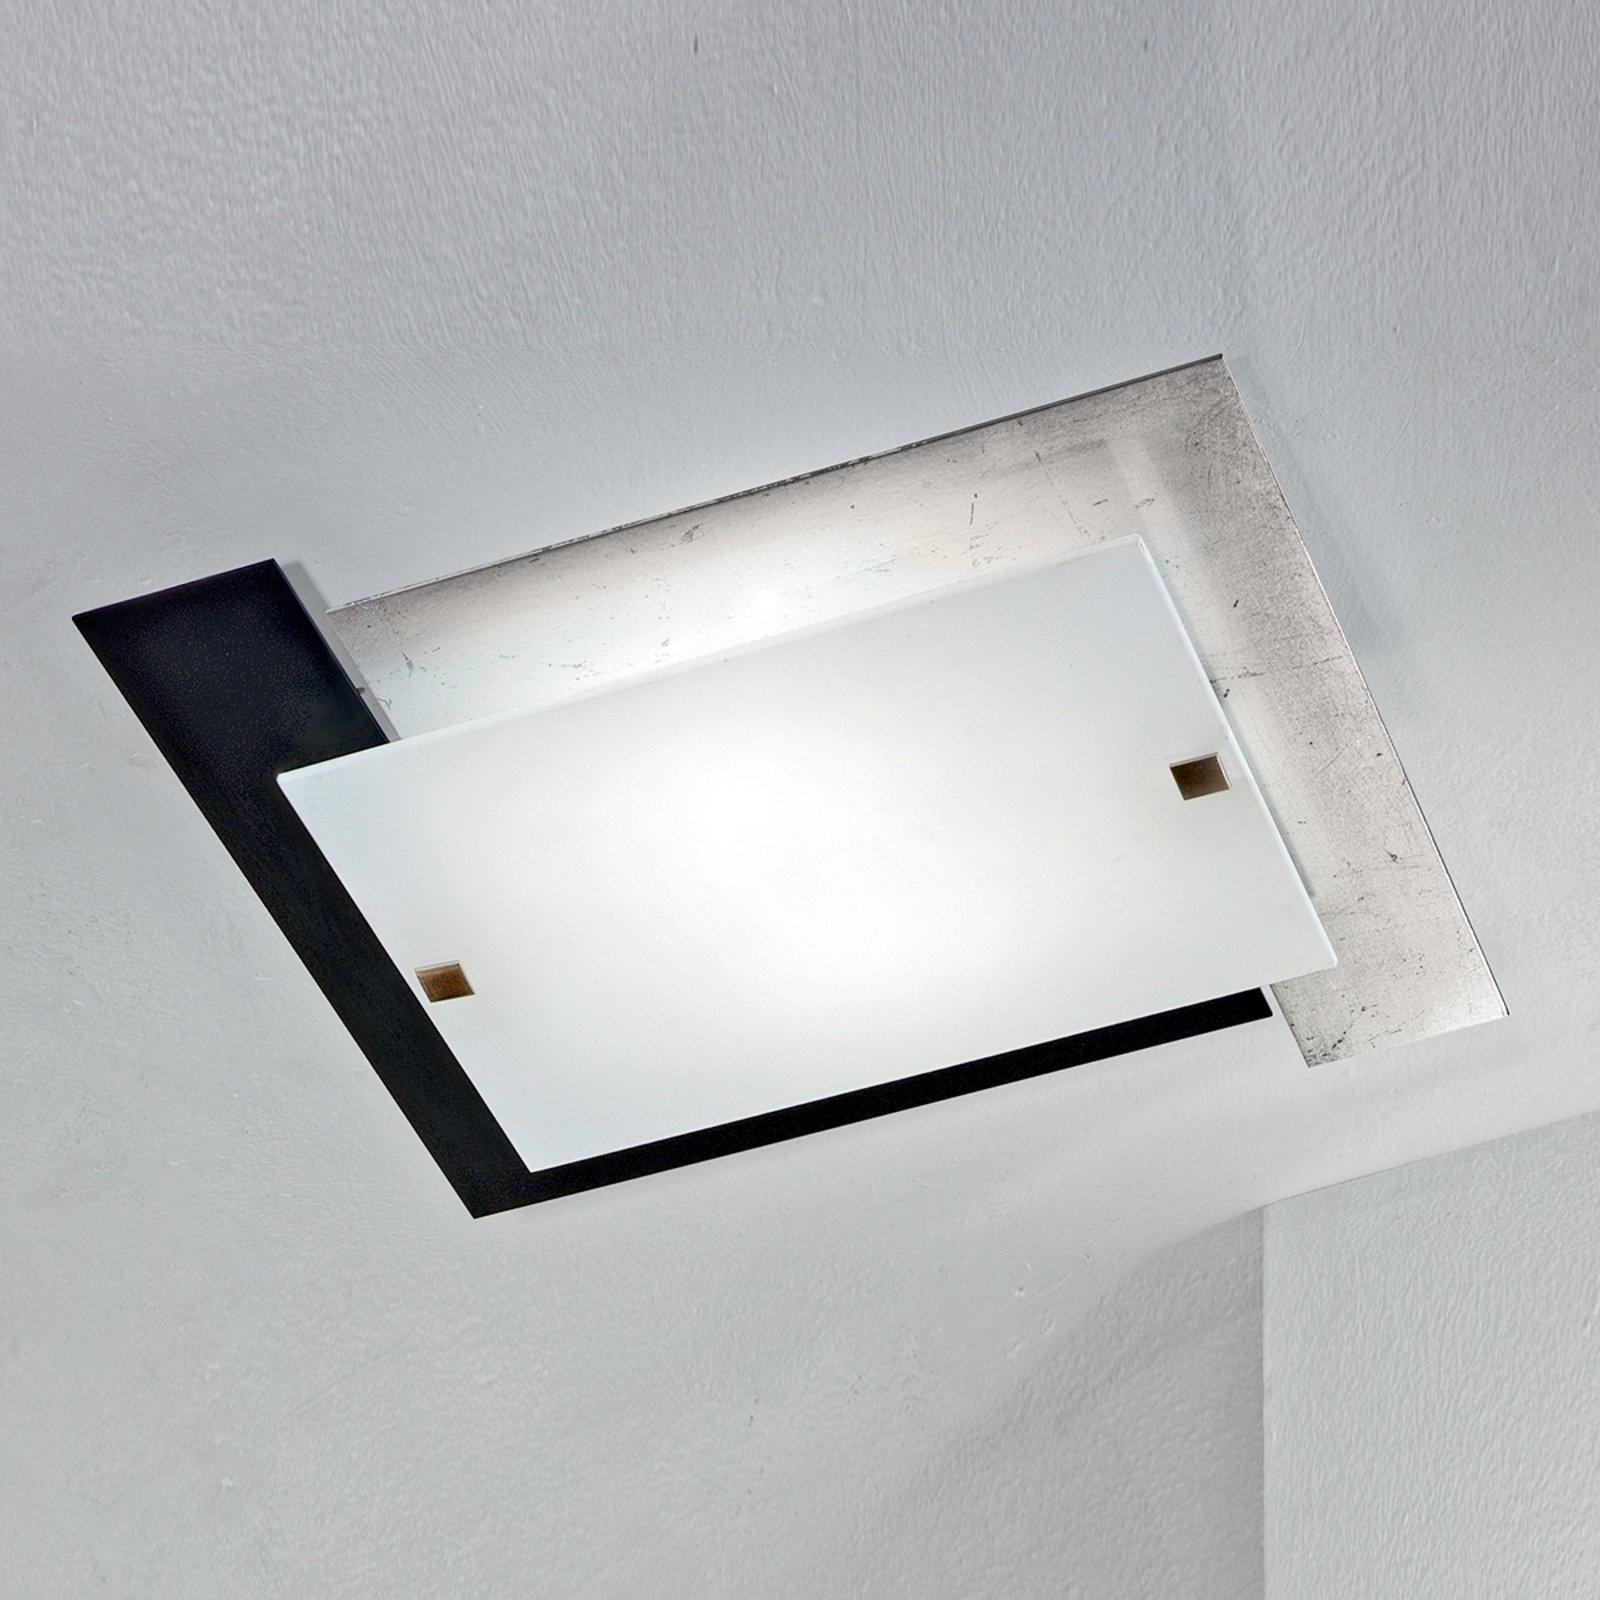 Særegen ARLESTRA taklampe i sølv